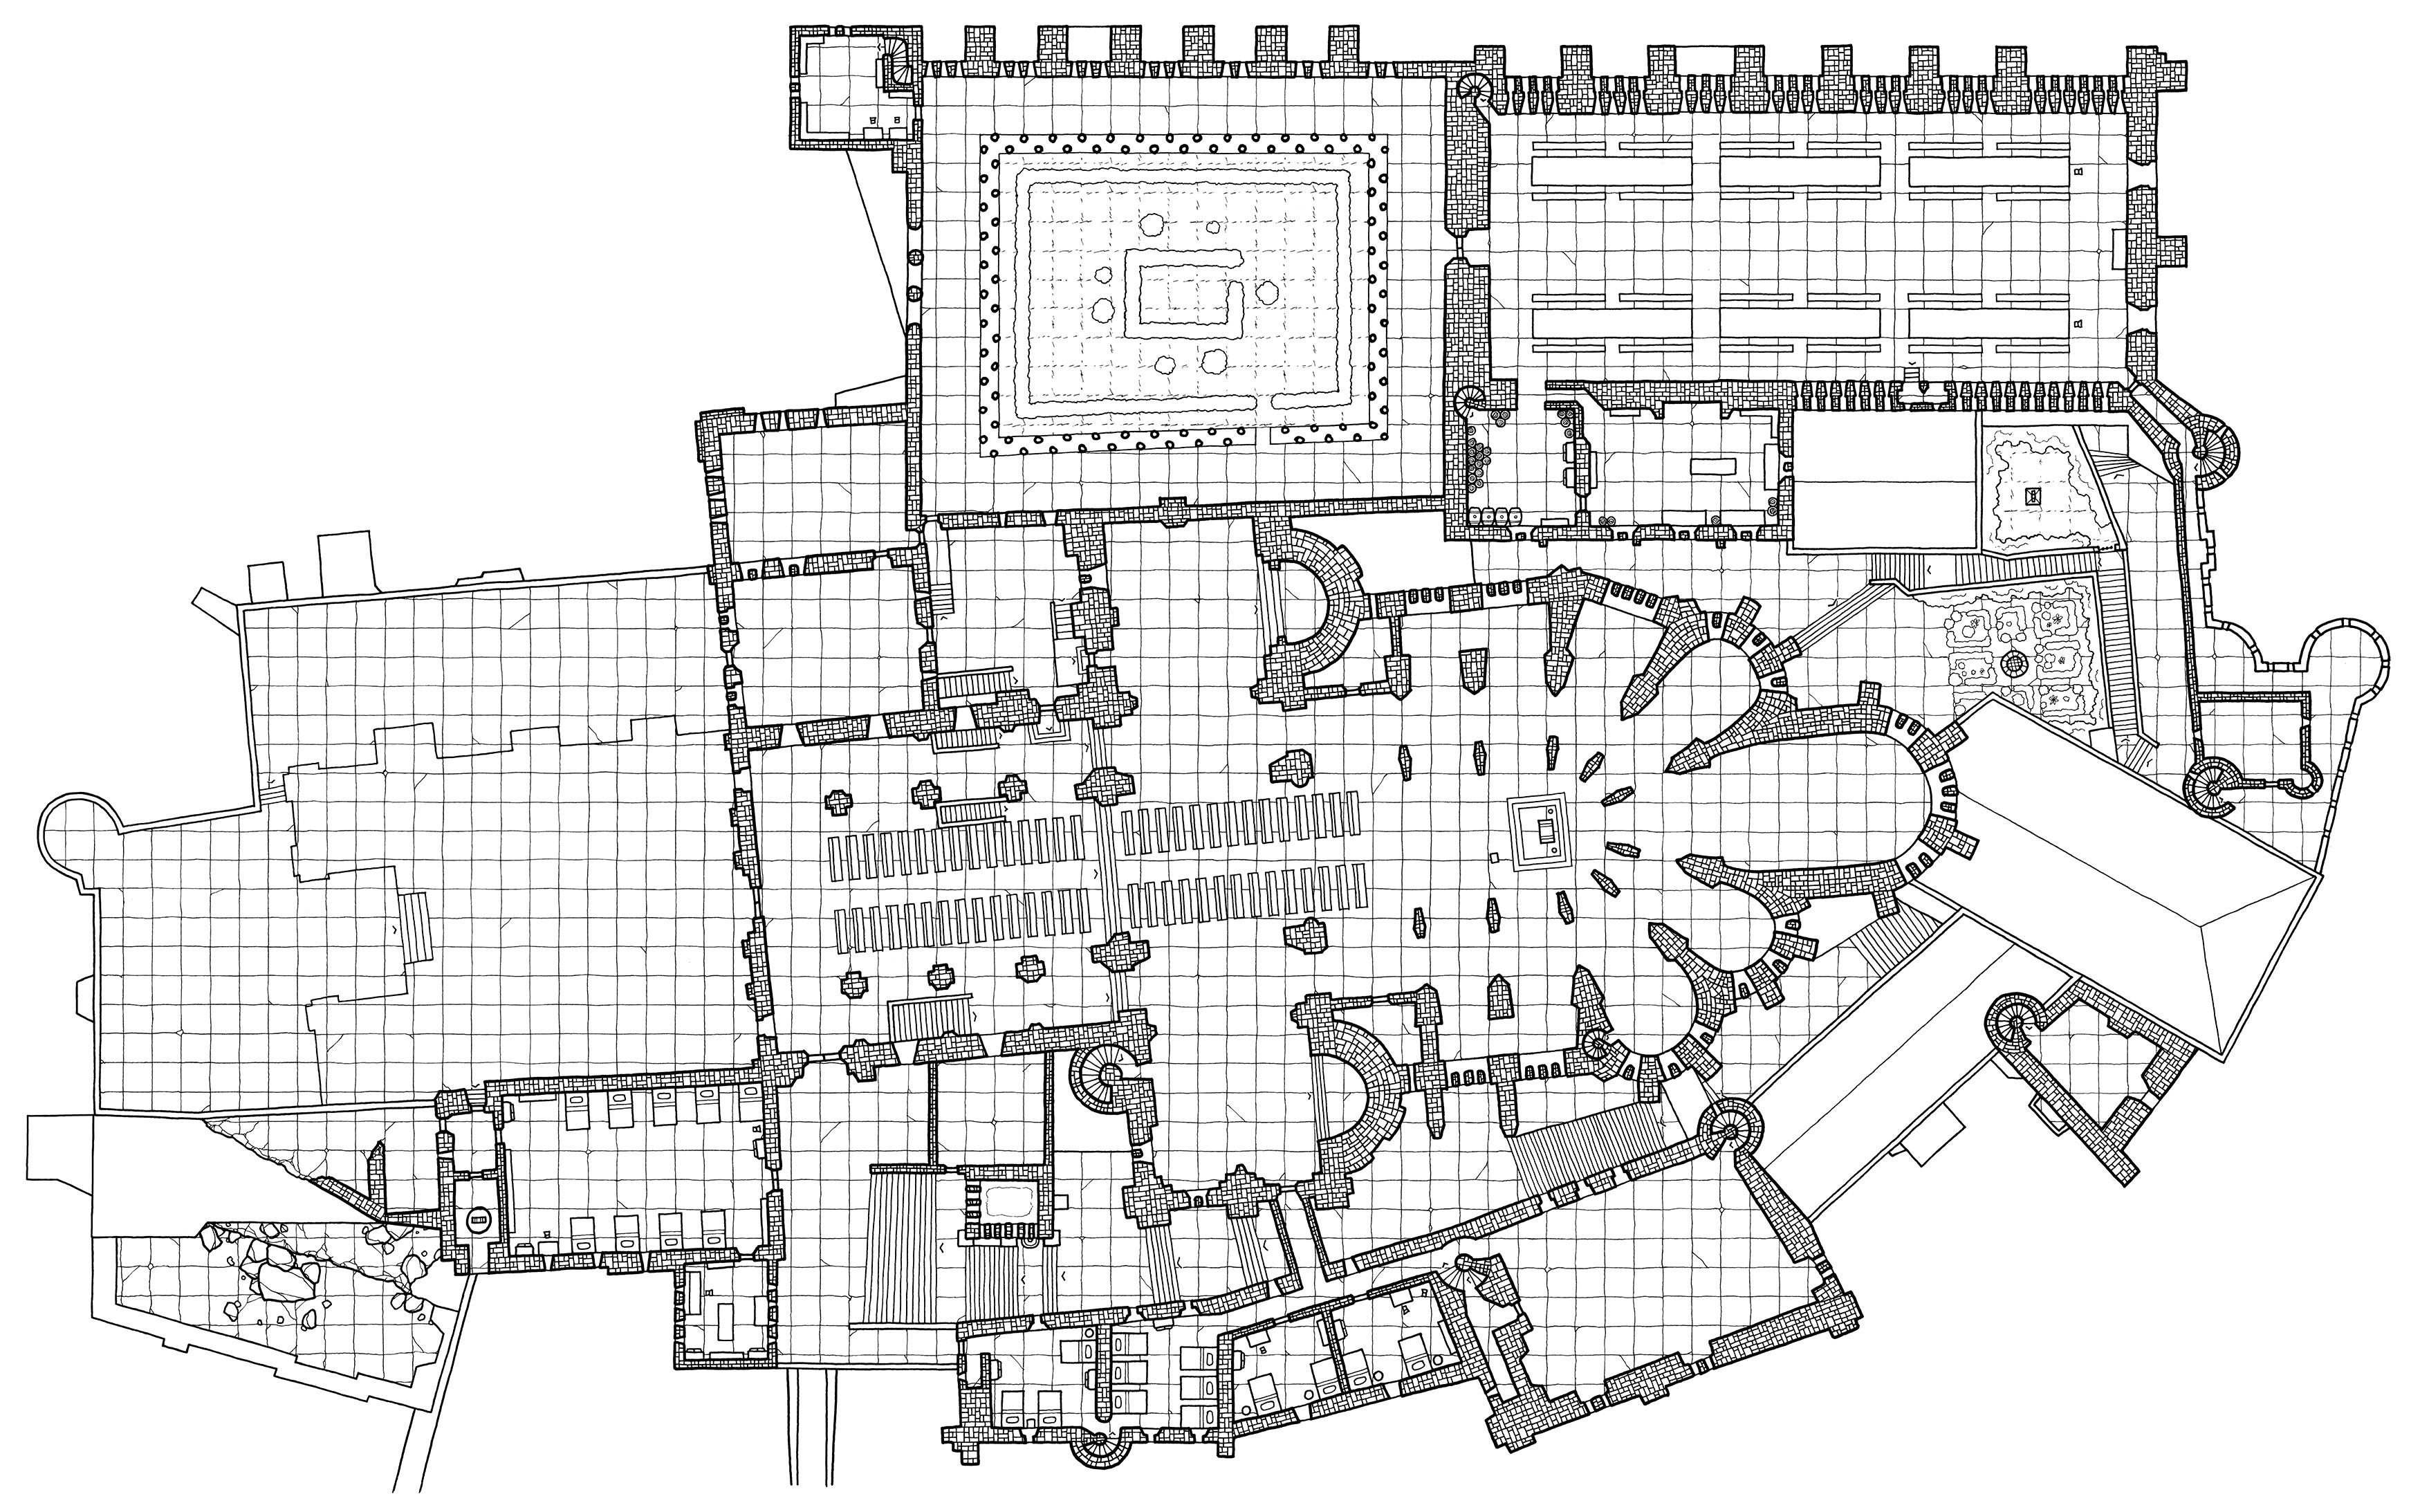 Mont-Saint-Michel – Work in Progress 7